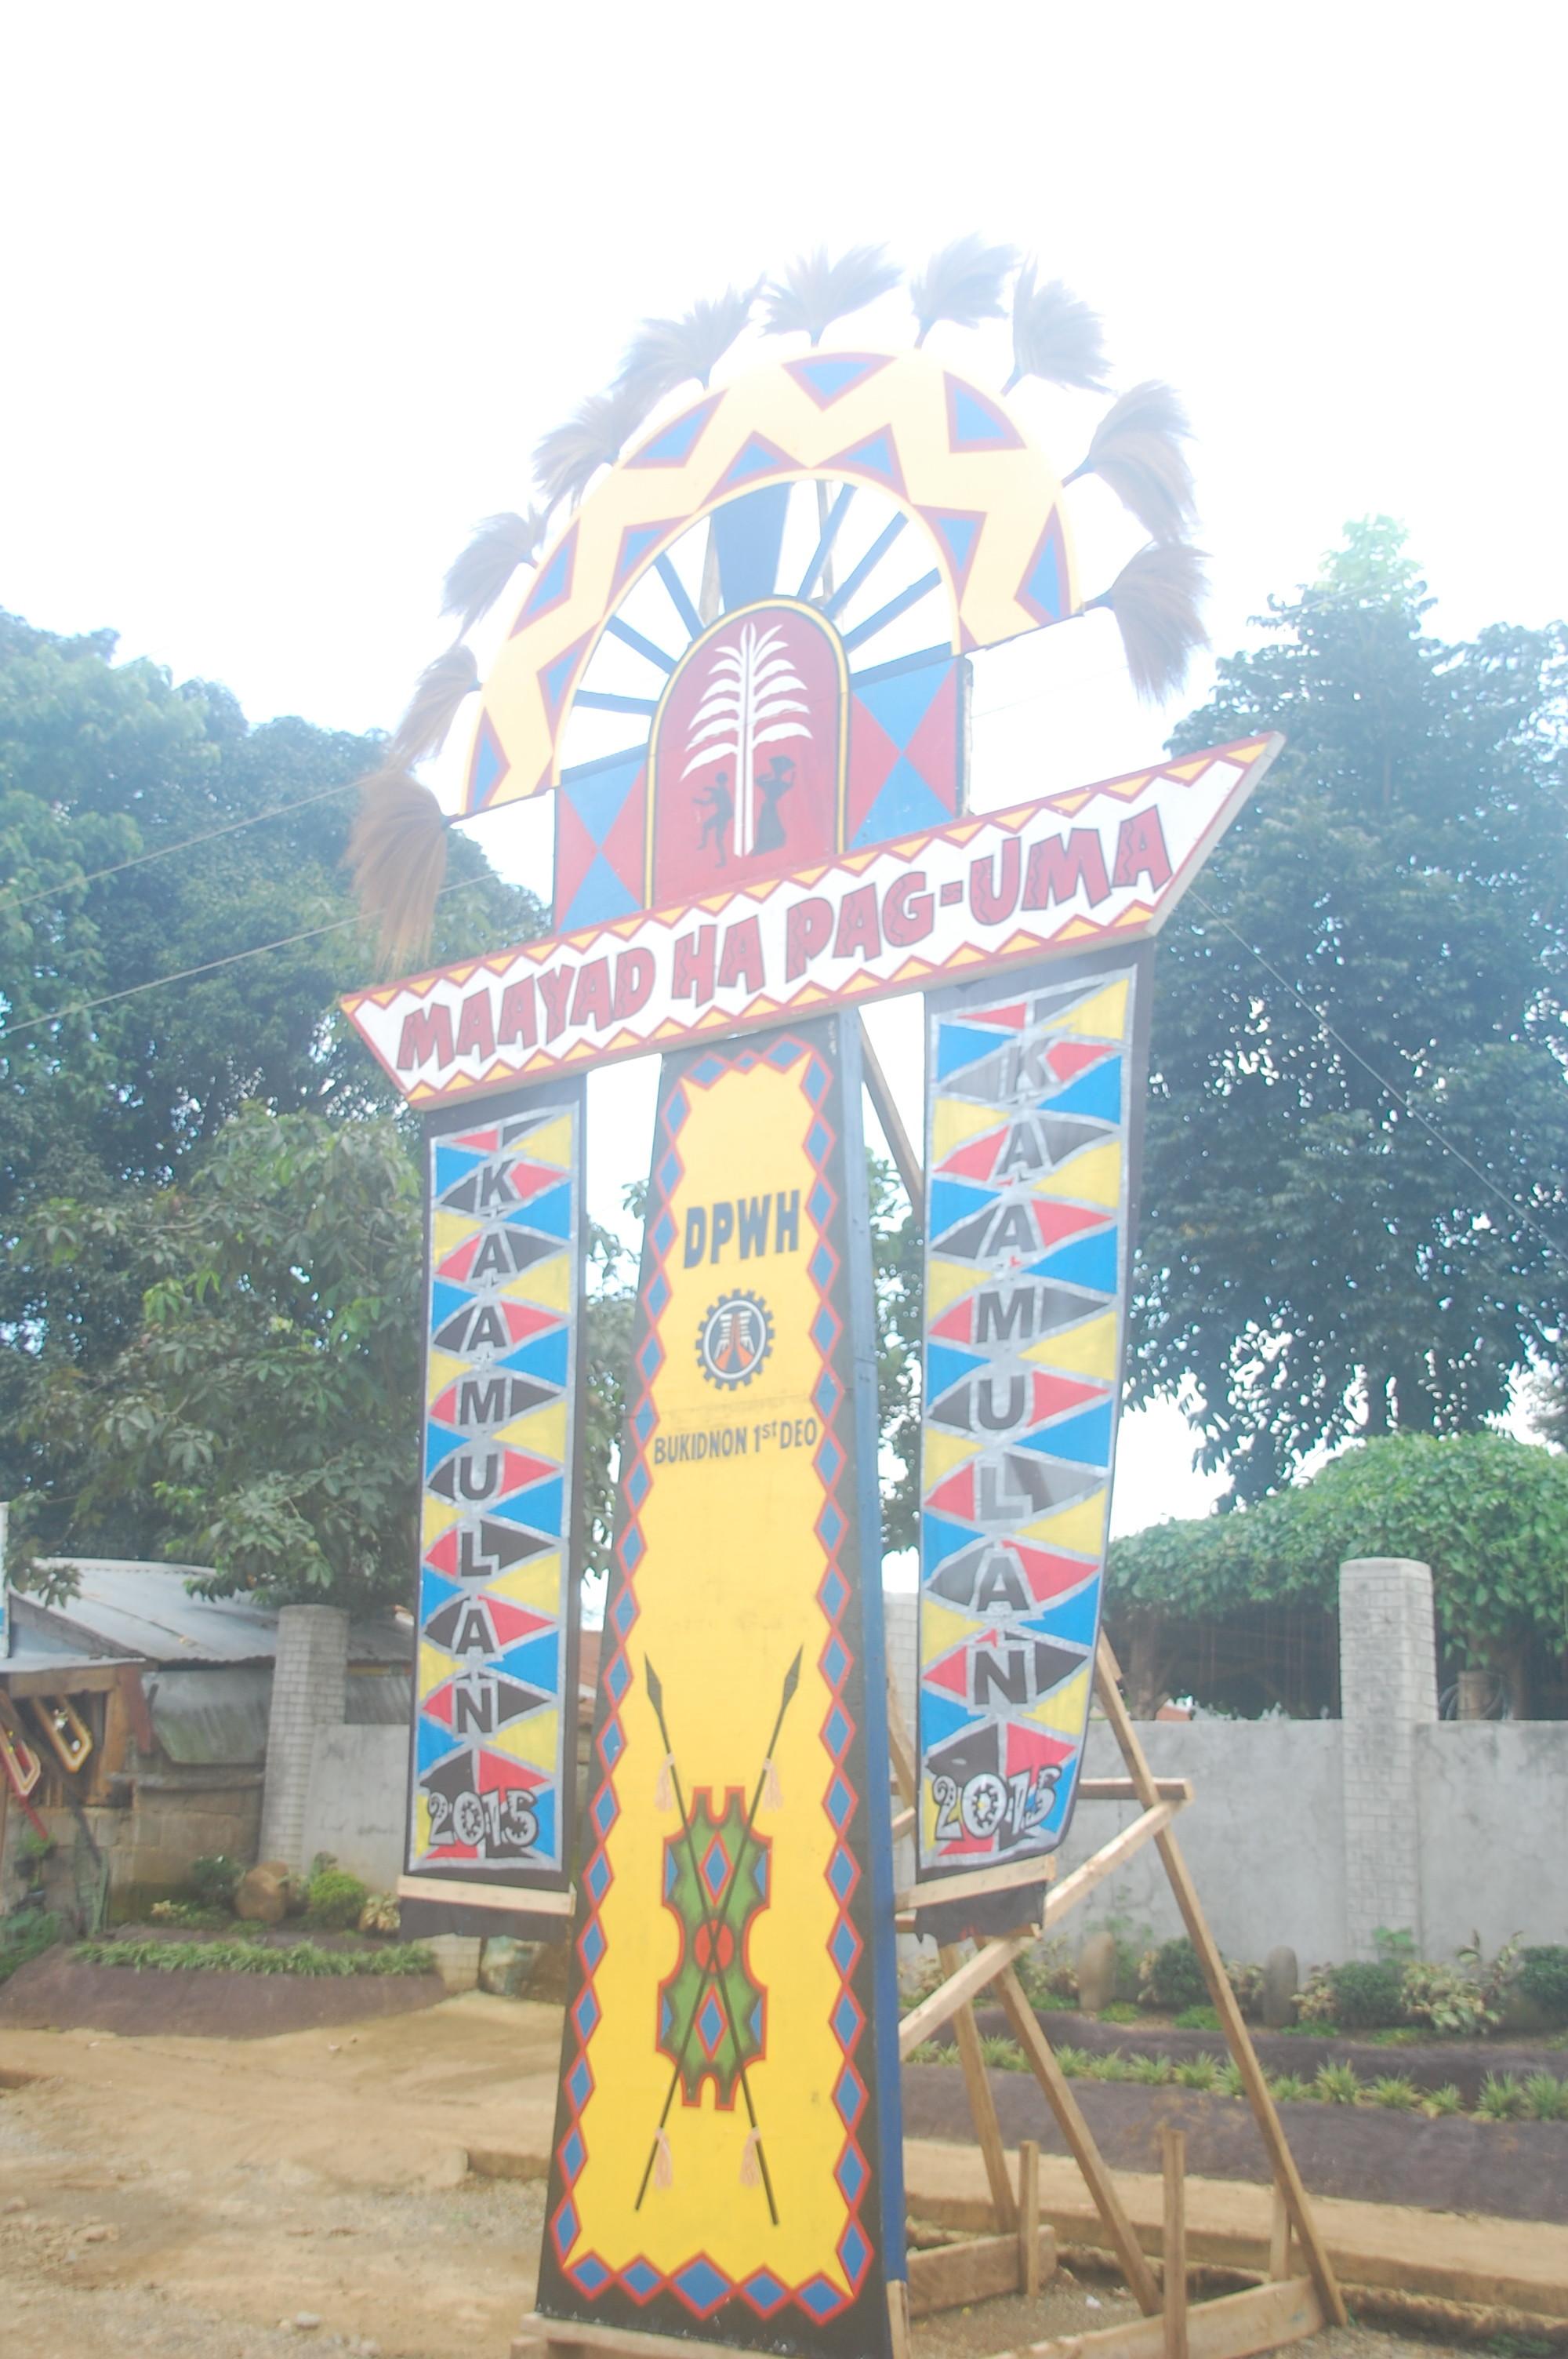 Photos: Kaamulan Festival 2015 at Grandstand Malaybalay Bukidnon